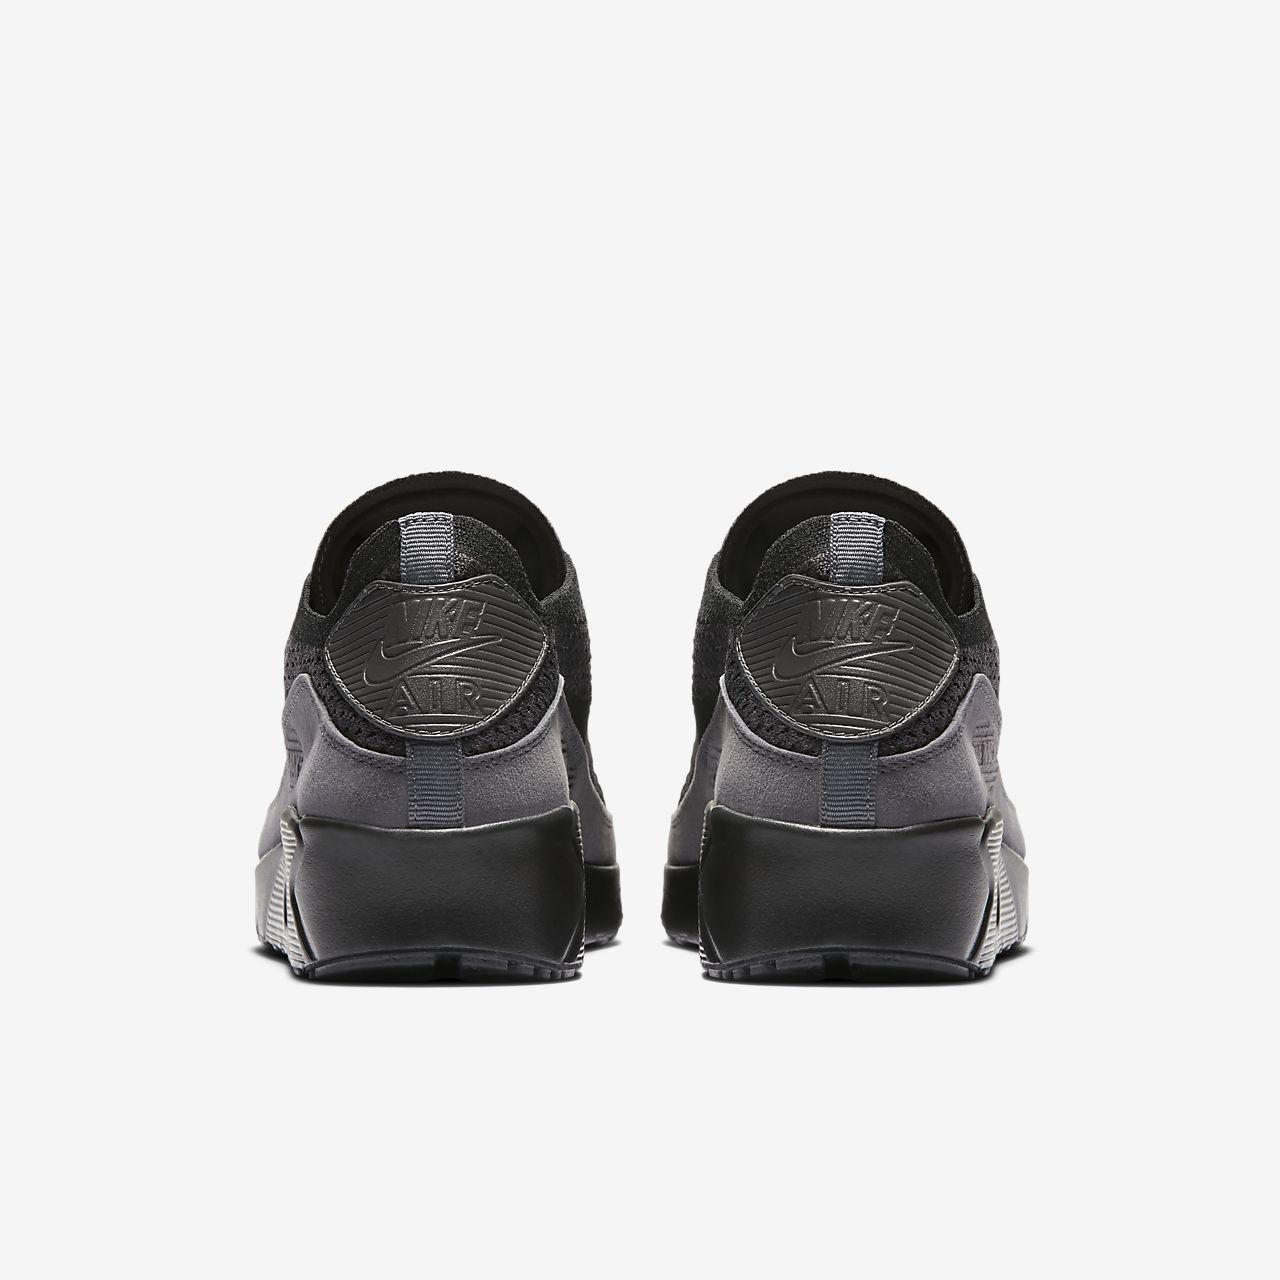 nike air max 90 ultra 2.0 flyknit - uomo scarpe